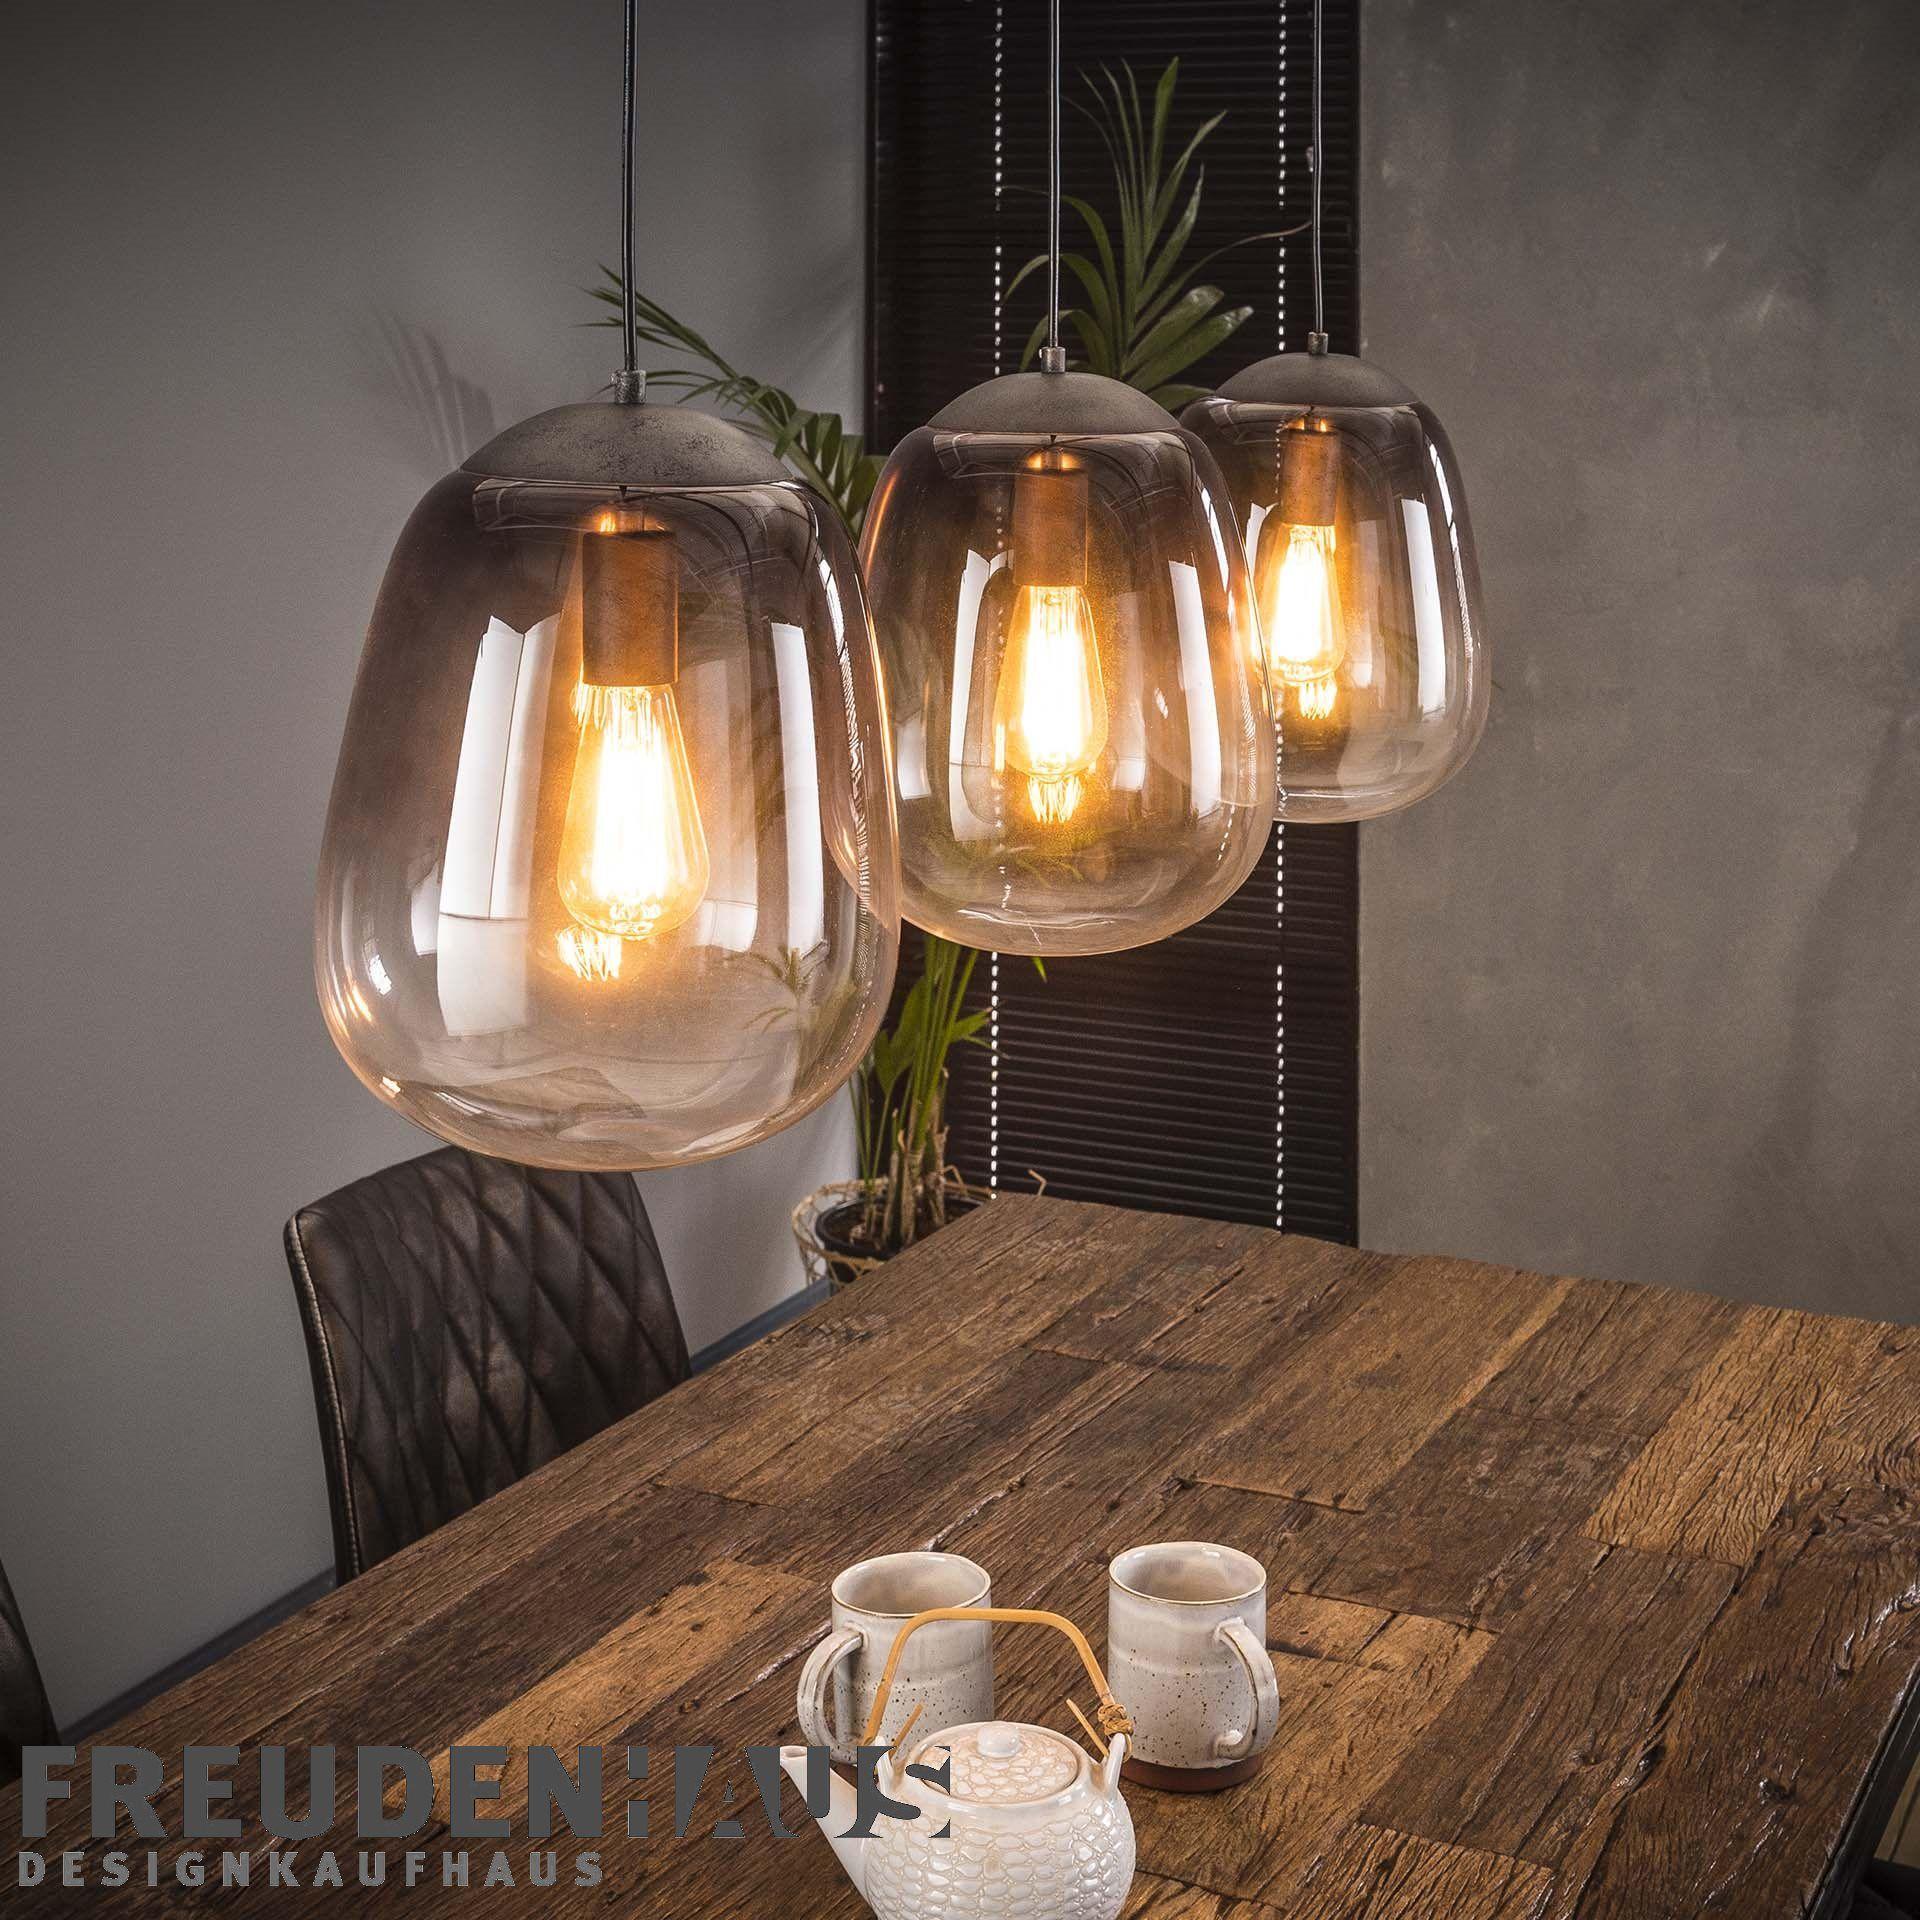 Hangelampe Shaded 3er Industrial Getontes Glas Beleuchtung Hangelampen Freudenhaus Designkaufhaus Rauchglas Industrie Stil Lampen Hange Lampe